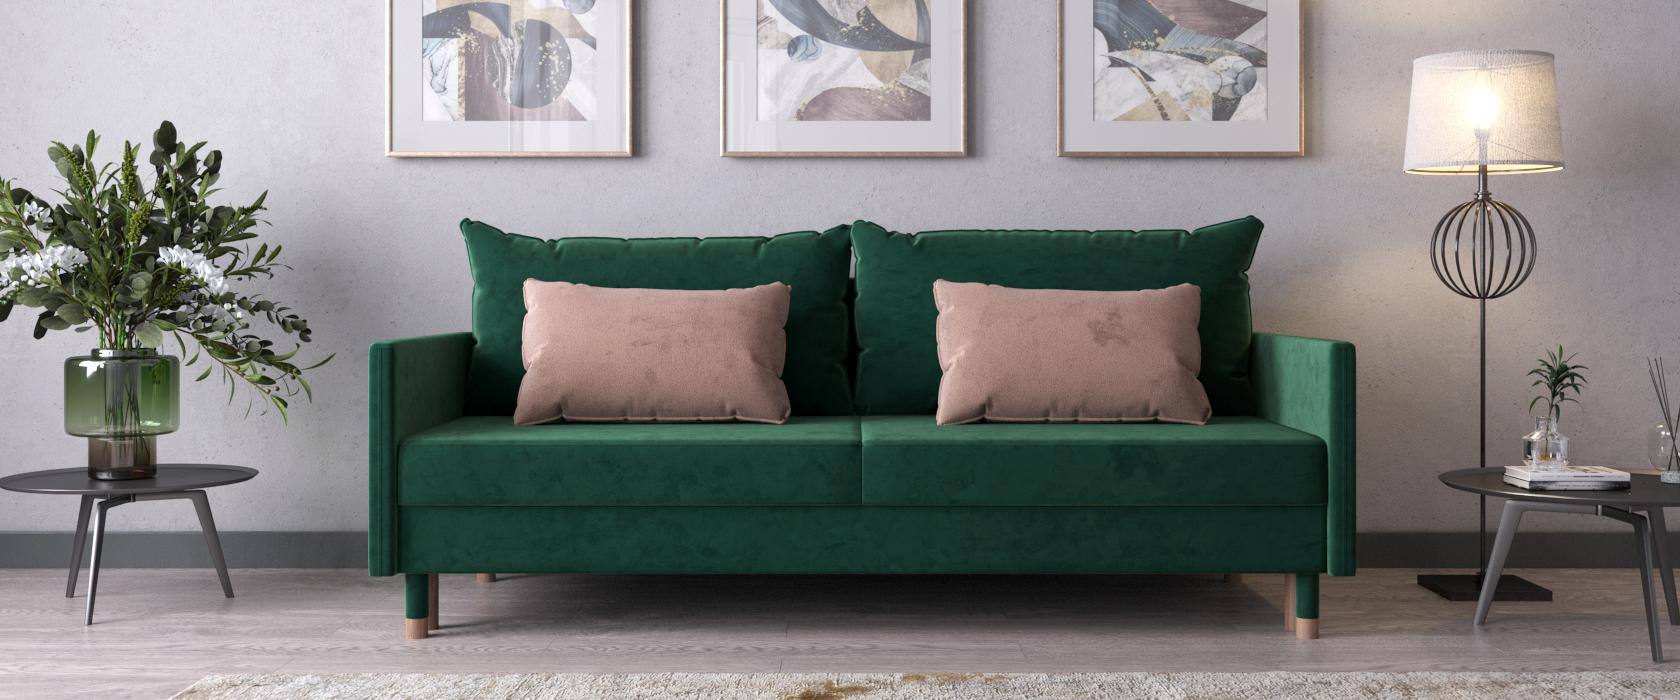 Трехместный диван Martino - Фото 2 - Pufetto